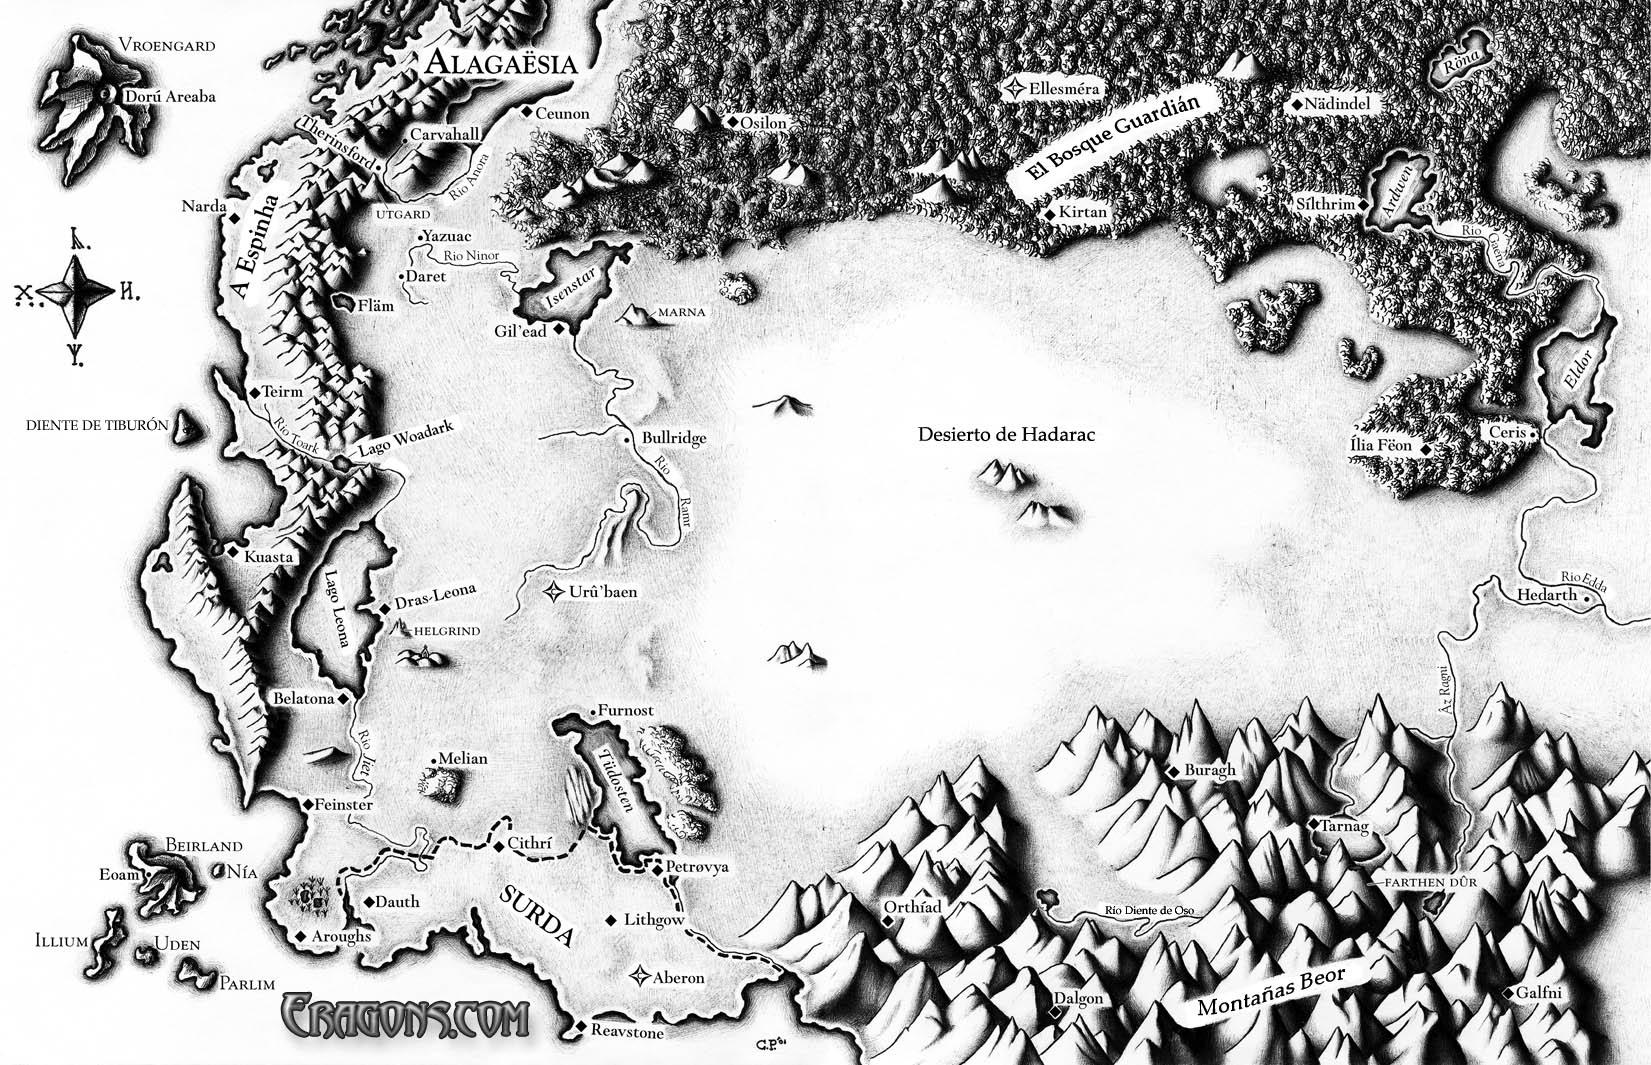 Karte Alagasia